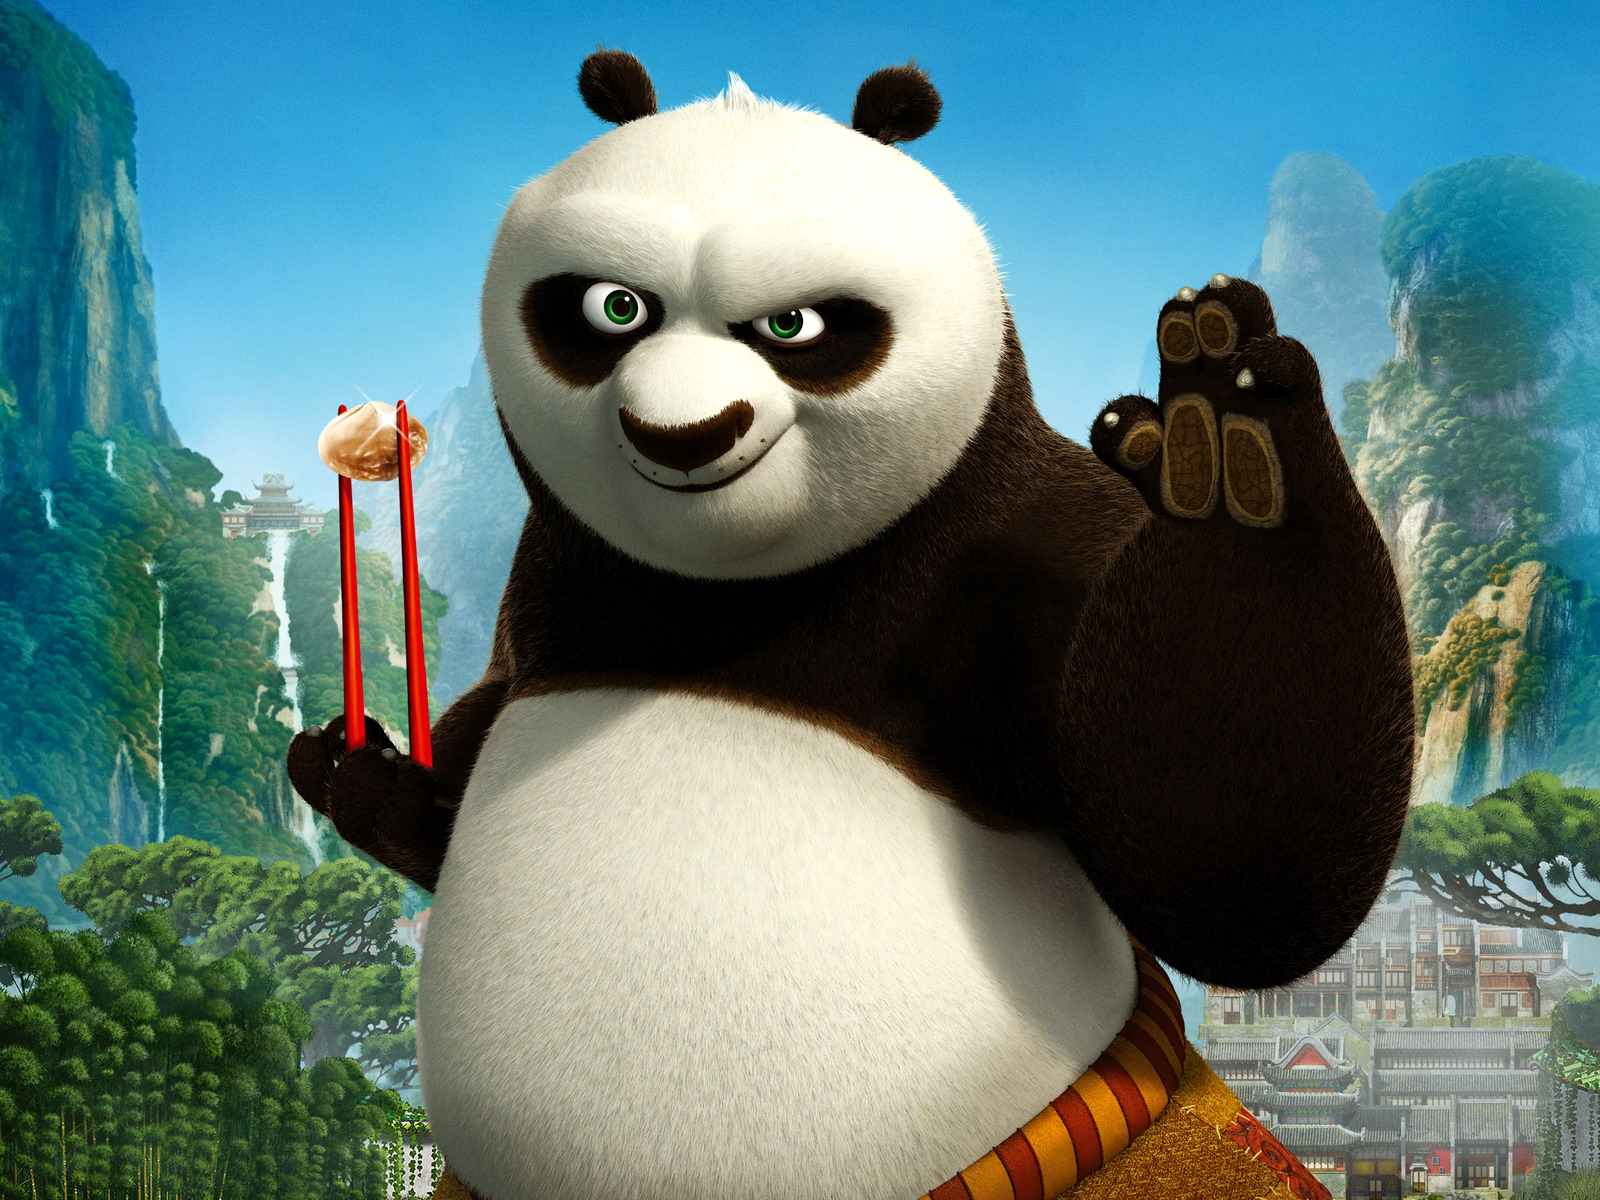 Kung fu panda 2 wallpapers hq wallpaper collections - Kung fu panda wallpaper ...